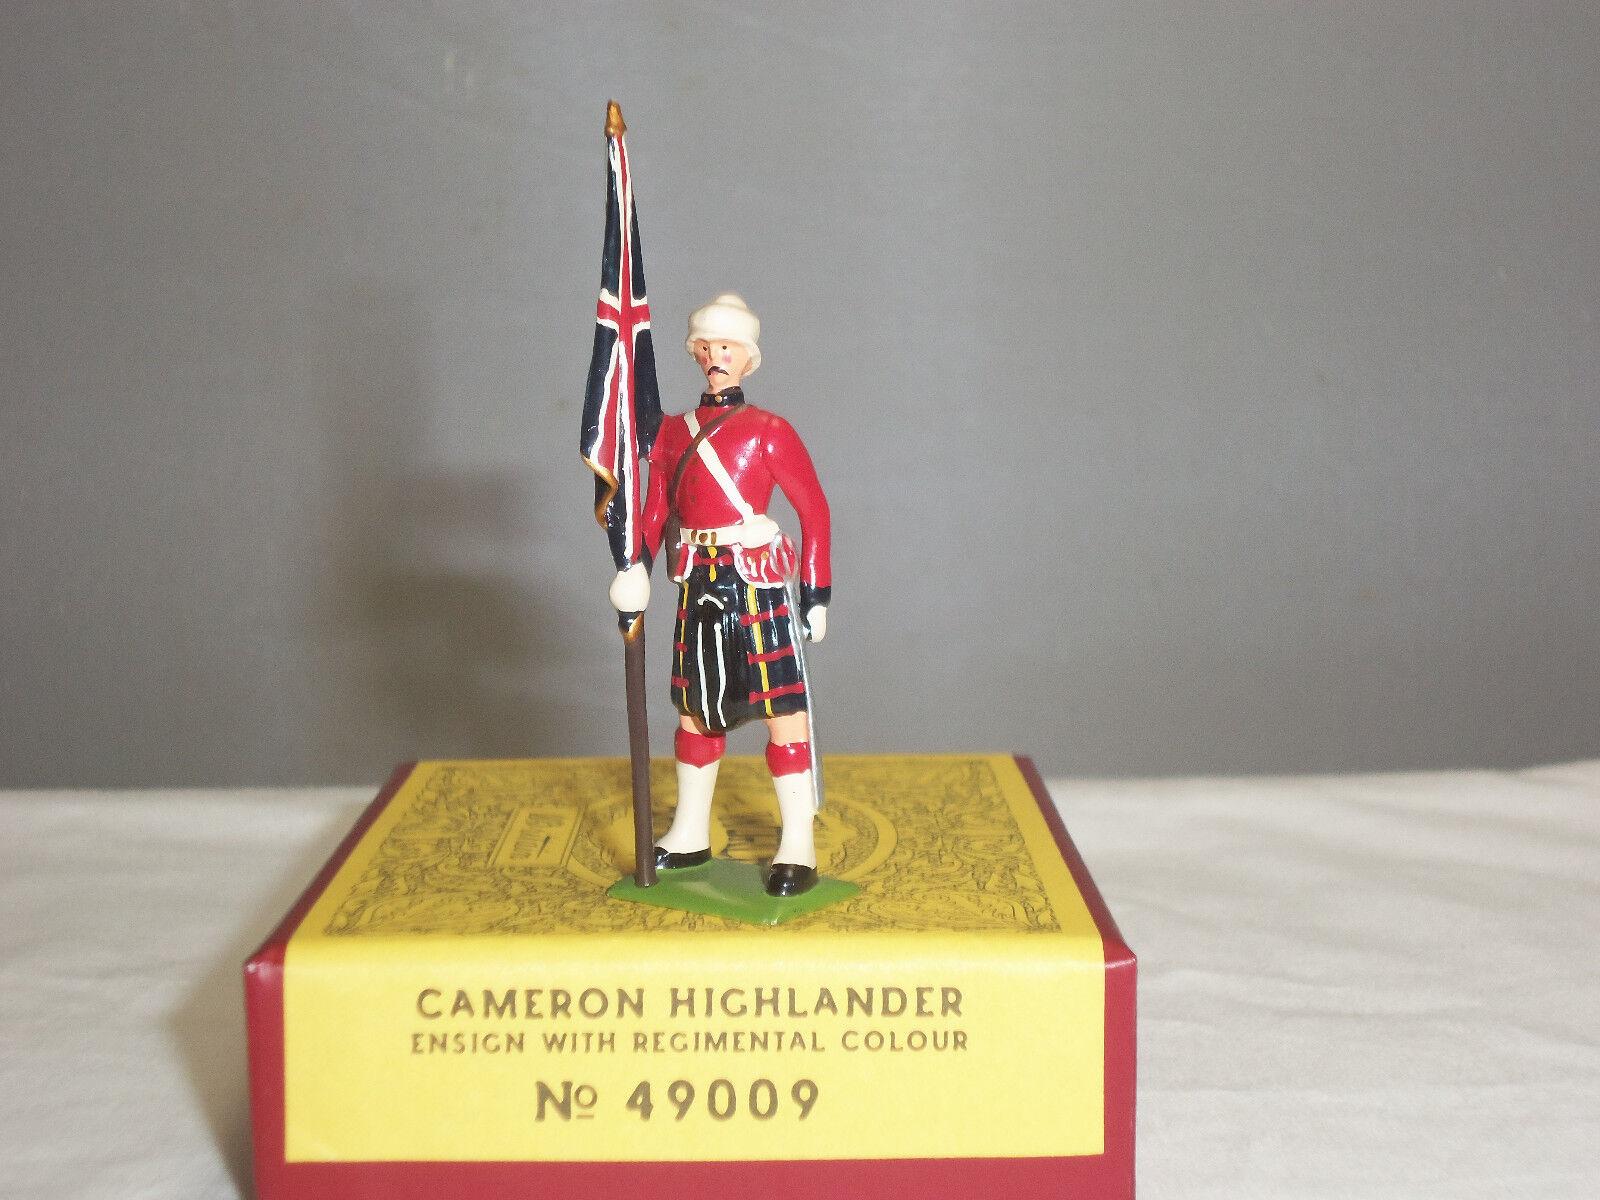 BRITAINS 49009 BRITISH CAMERON HIGHLANDER ENSIGN REGIMENTAL COLOUR TOY SOLDIER